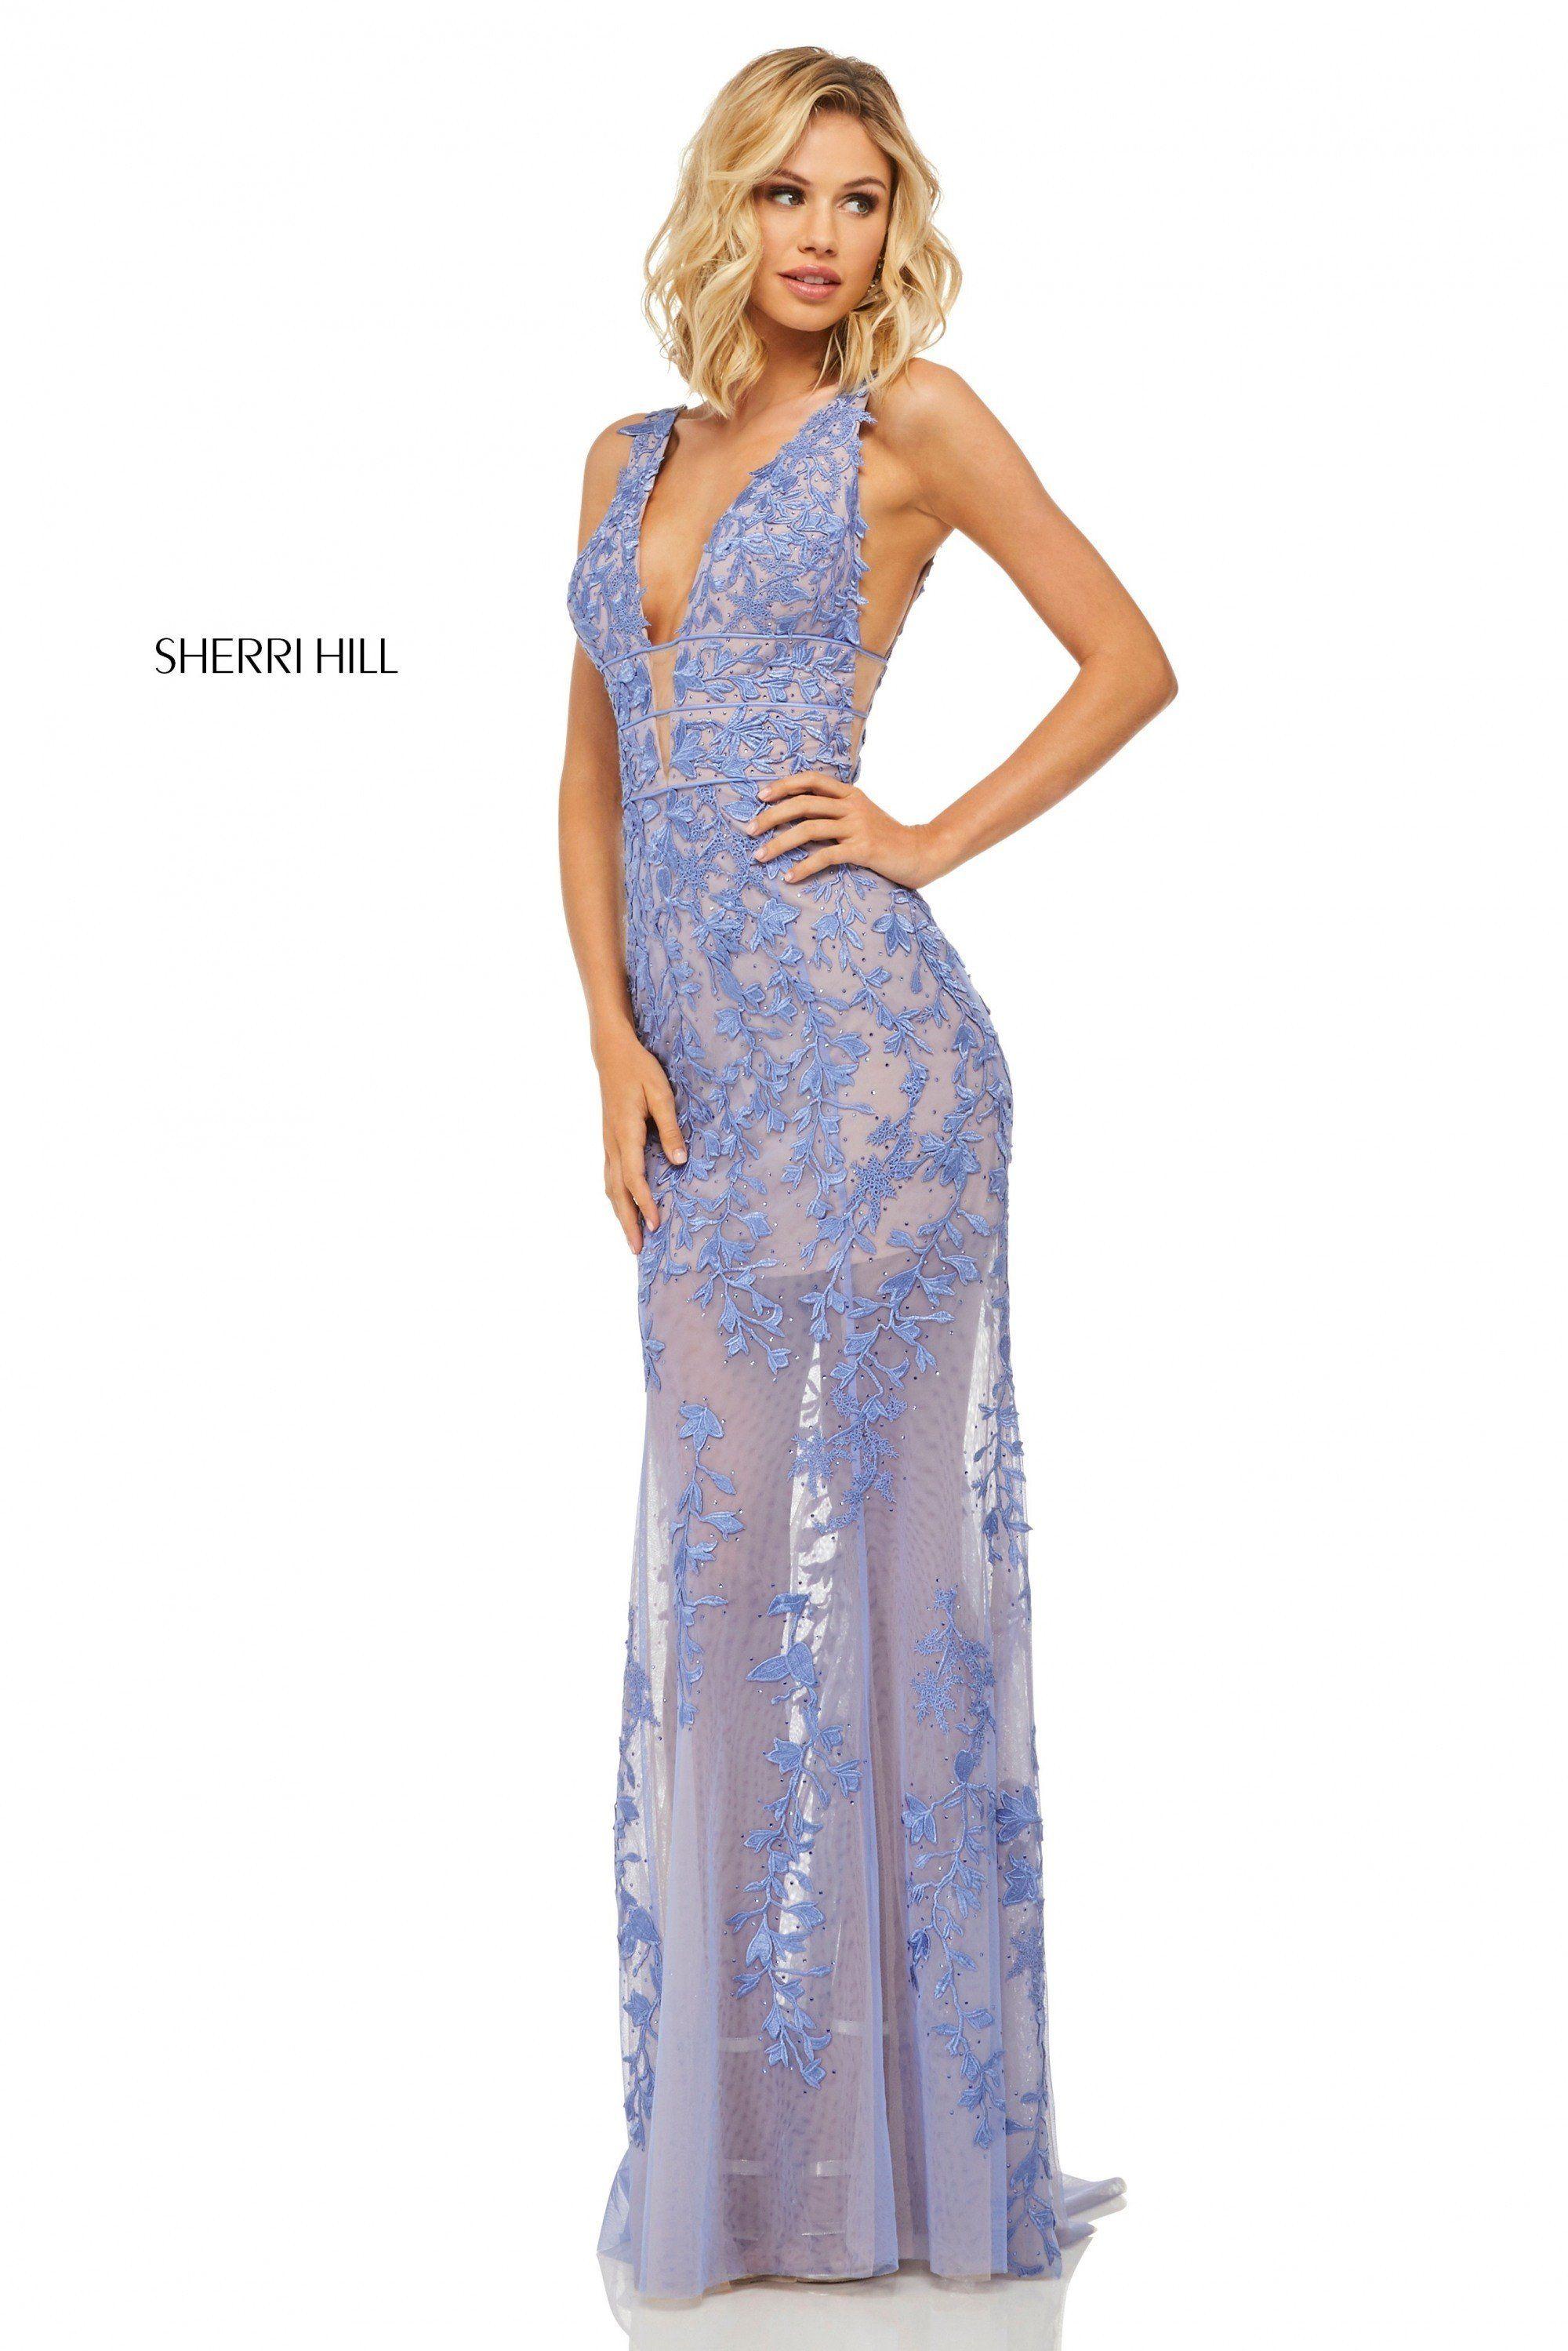 885be1ec512 Sherri Hill 52820 Sheer Lace Gown in 2019